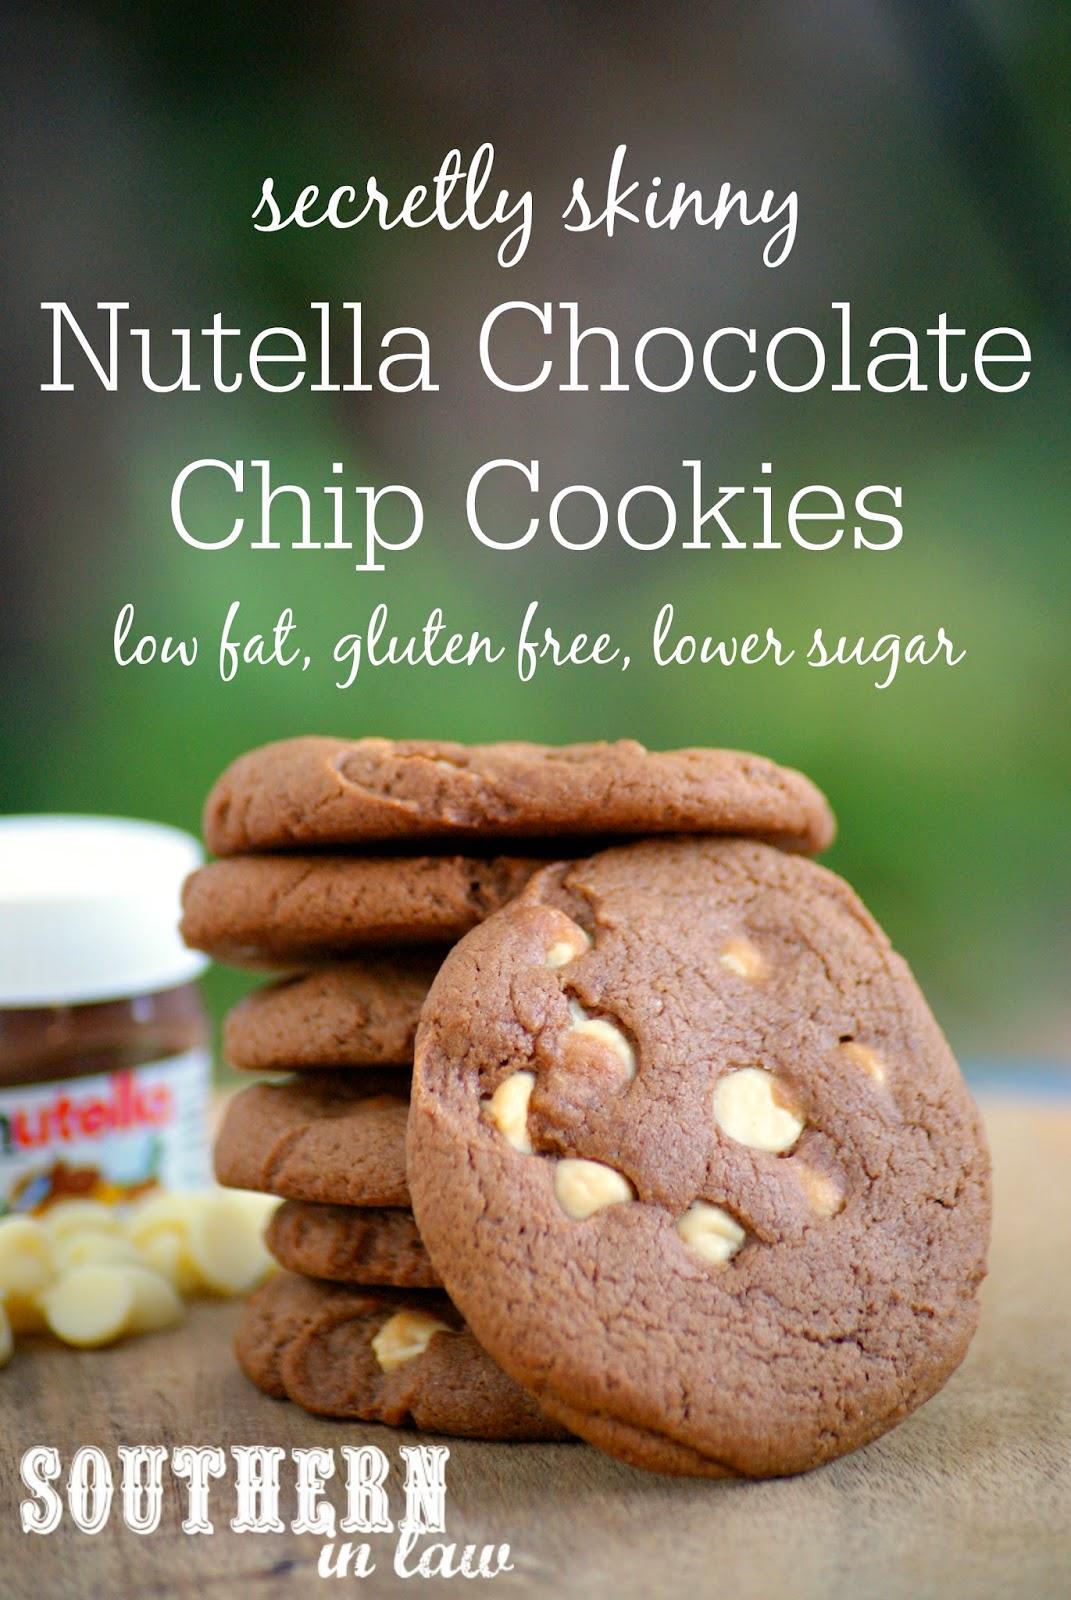 Secretly Skinny Gluten Free Nutella Chocolate Chip Cookie Recipe - low fat, gluten free, lower sugar